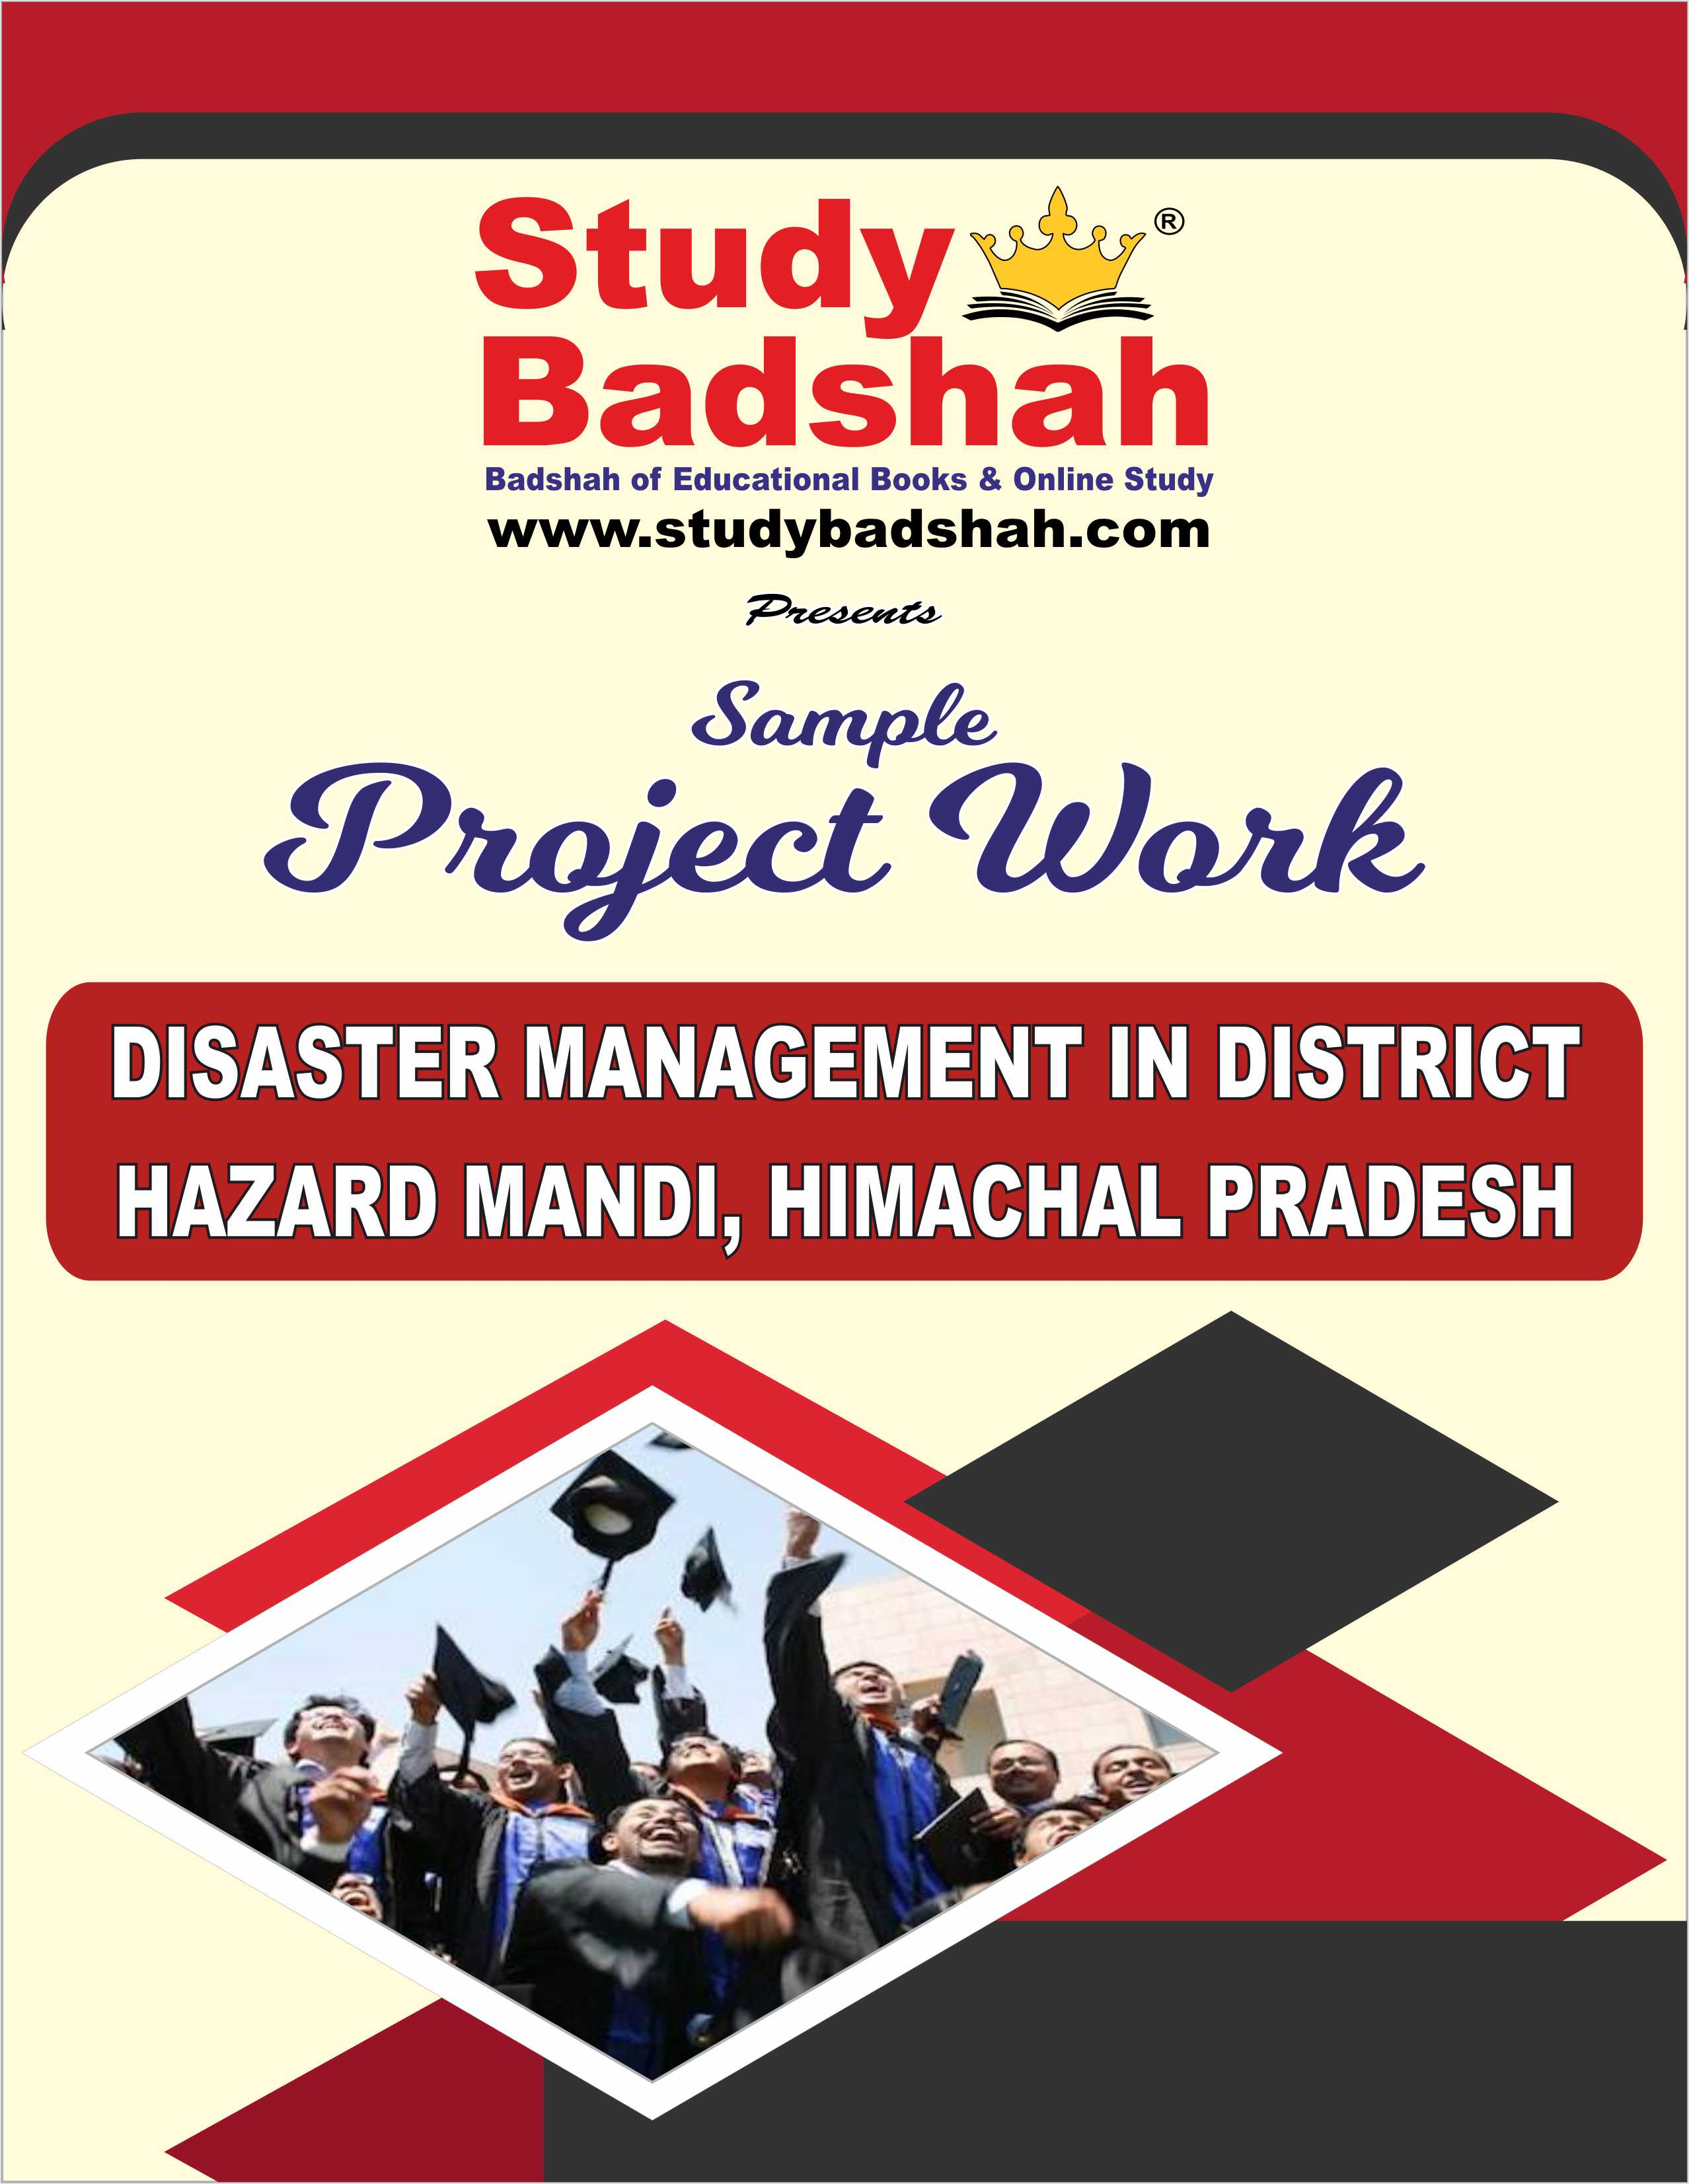 DISASTER MANAGEMENT IN DISTRICT HAZARD MANDI, HIMACHAL PRADESH